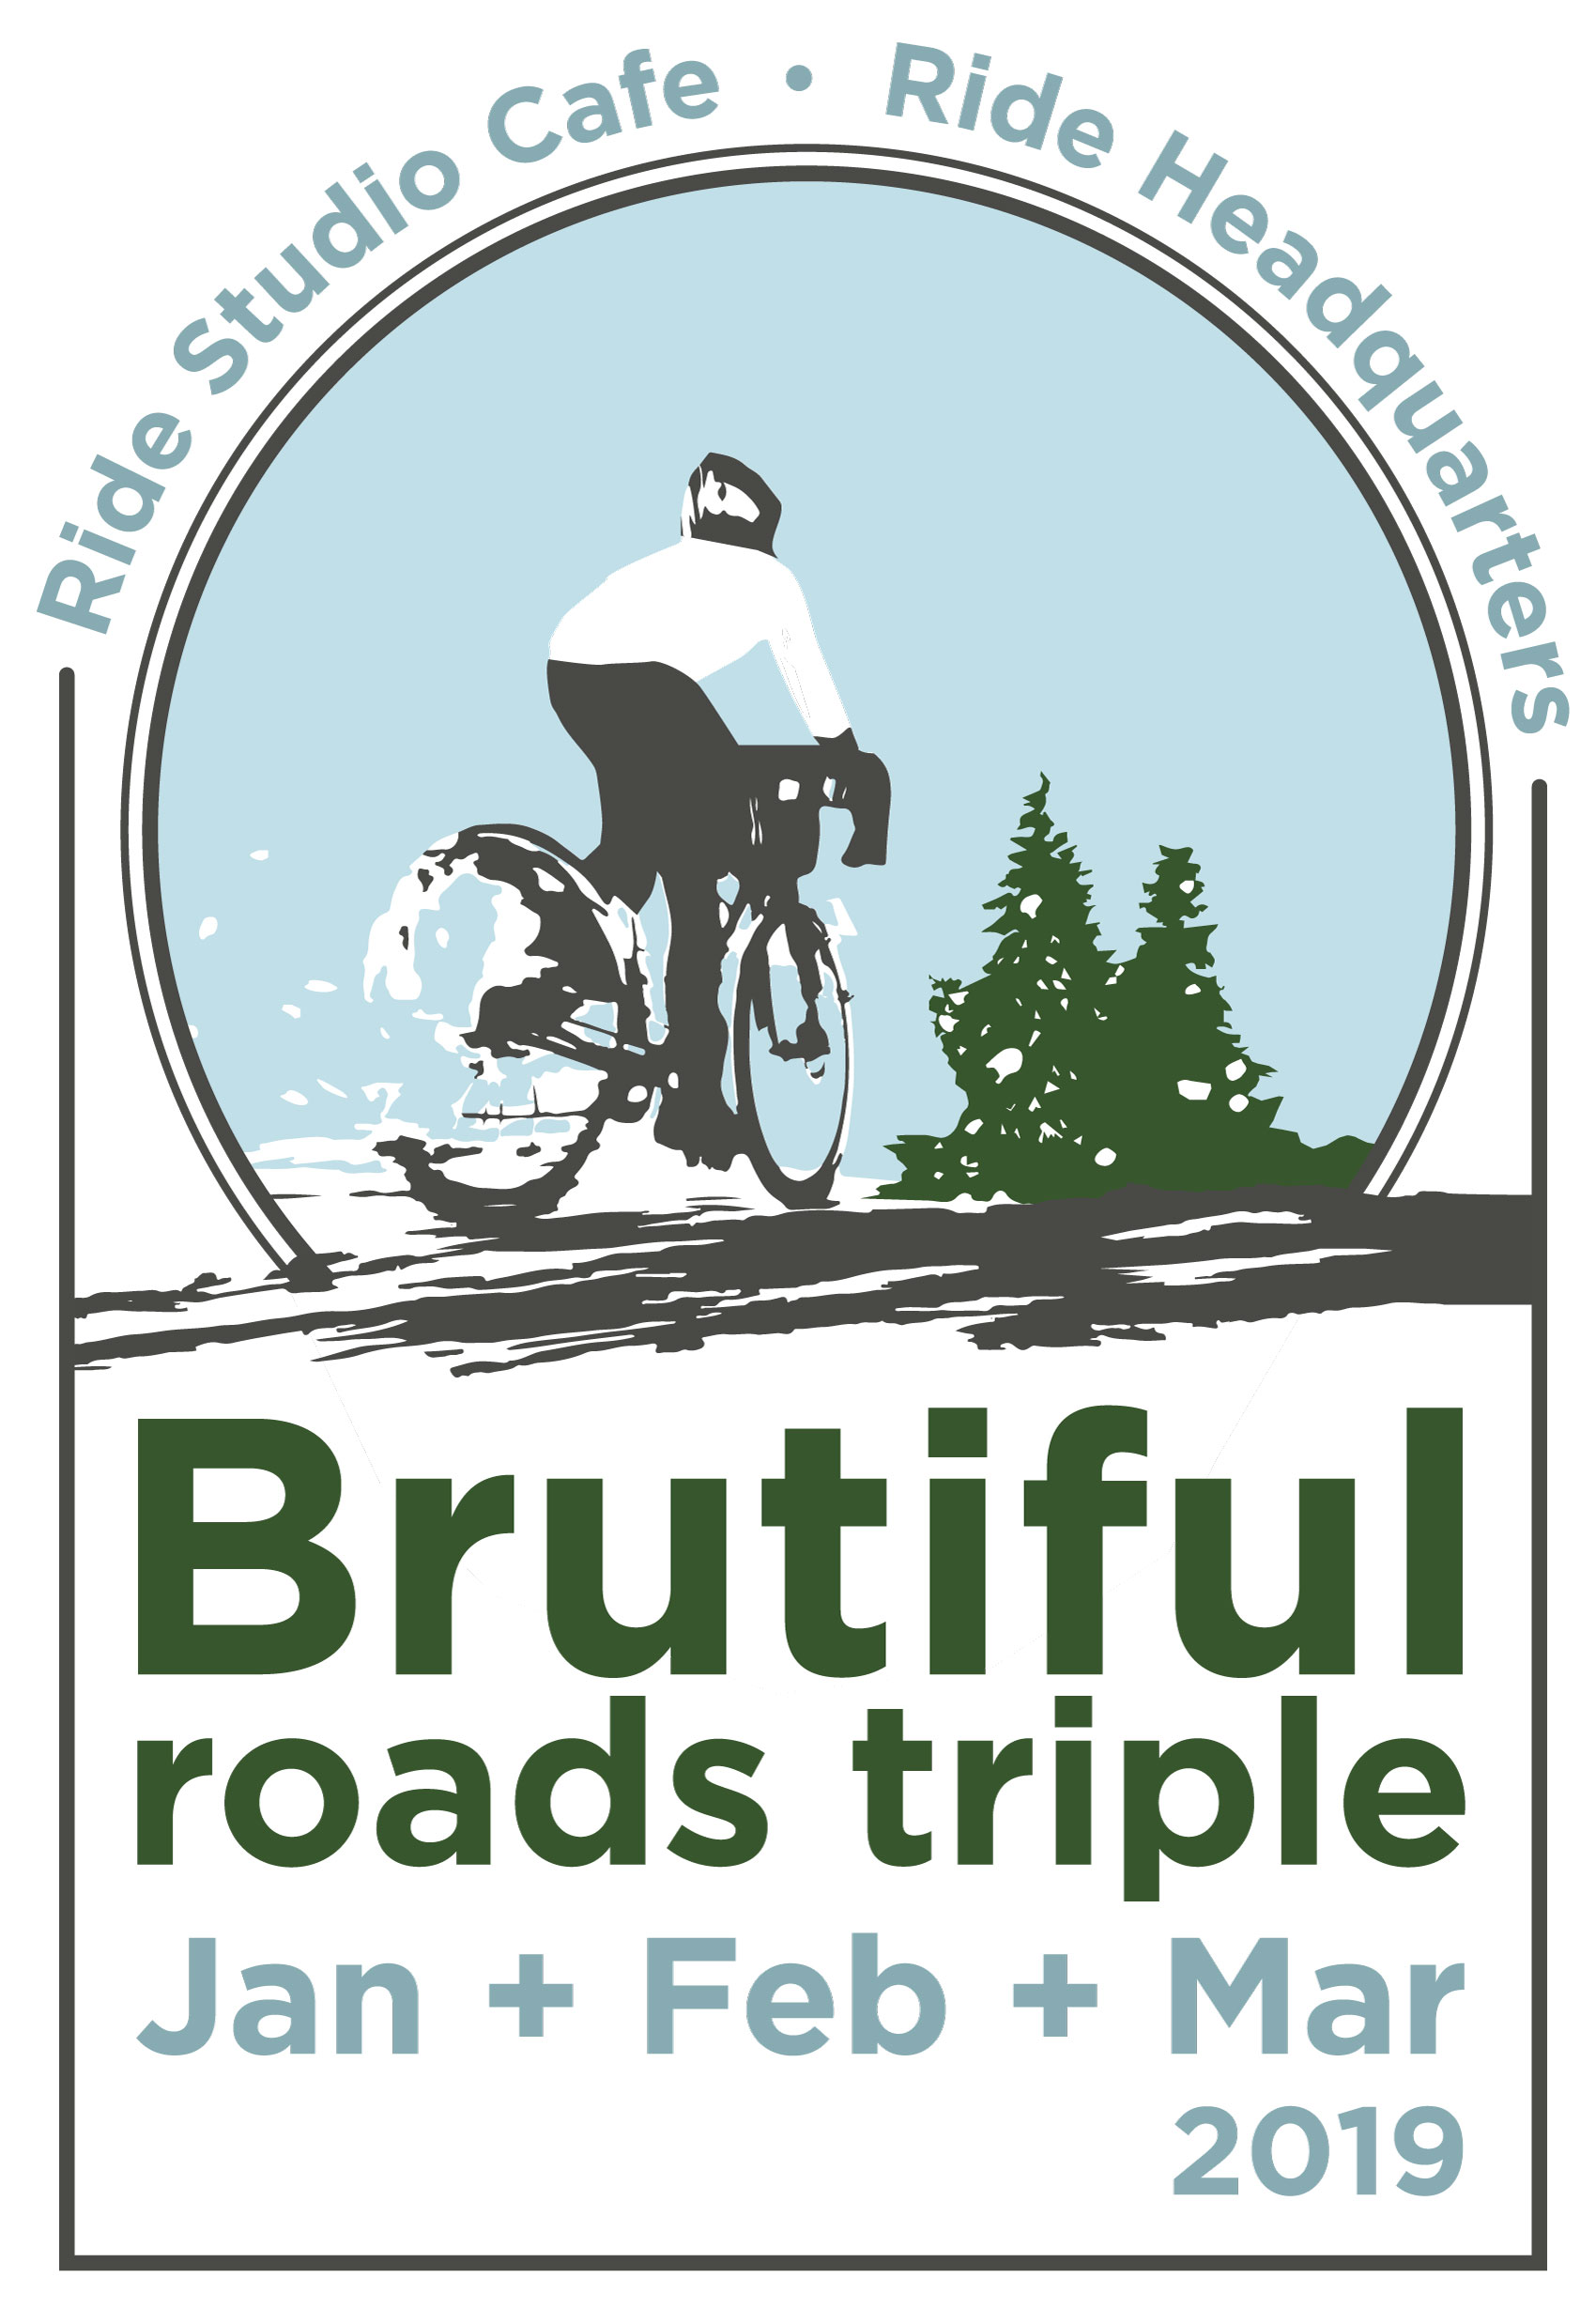 Brutiful-Roads-Triple-logo-181207.jpg